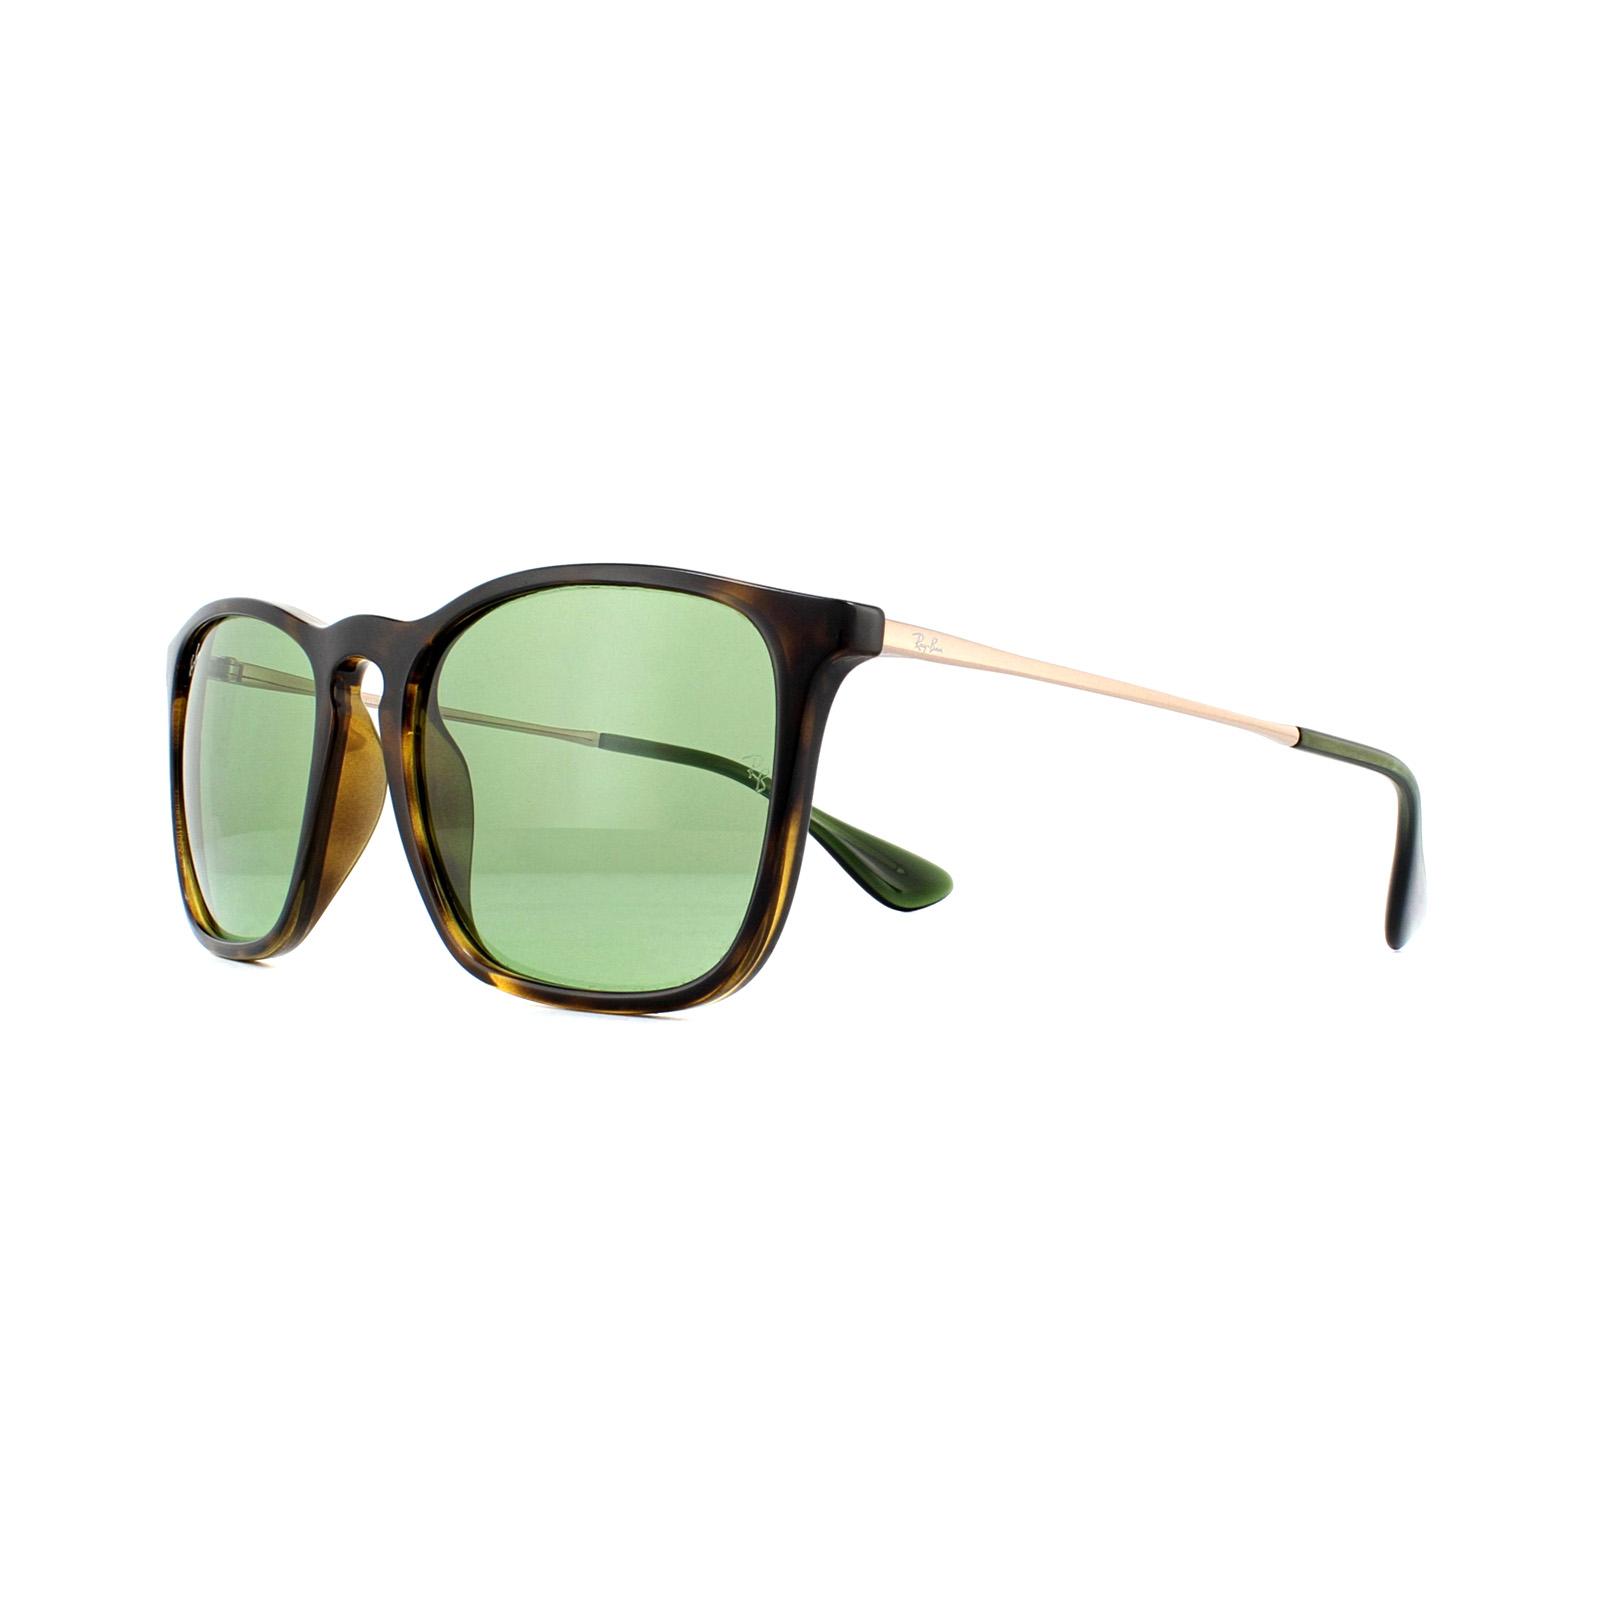 4d59638d27 Ray-Ban Sunglasses Chris 4187 6393 2 Havana Green 8053672977240